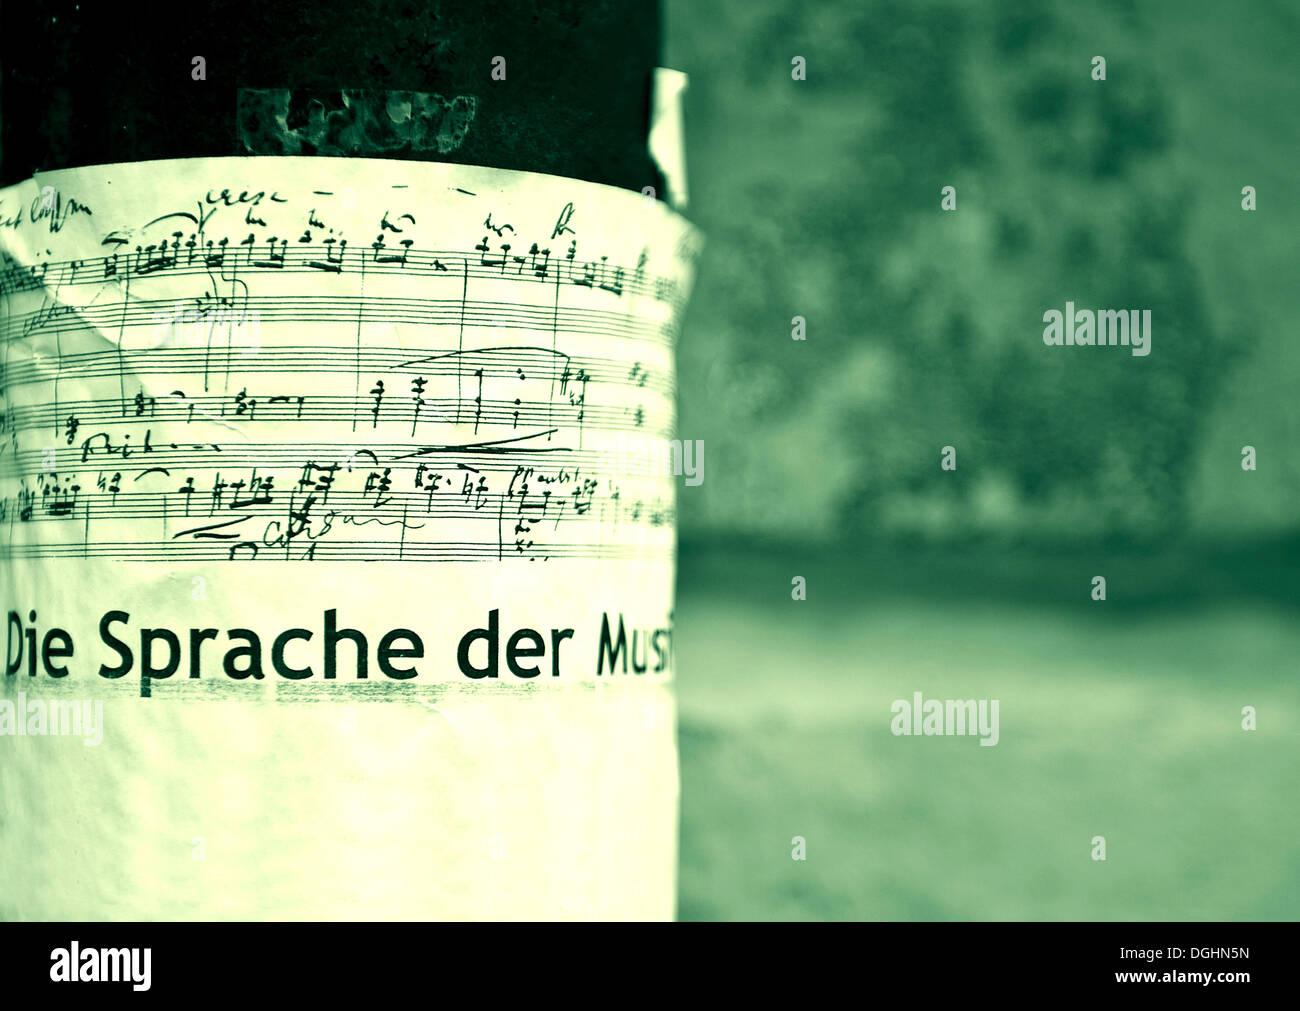 Placard on music, 'Die Sprache der Musik', German for 'Language of music - Stock Image